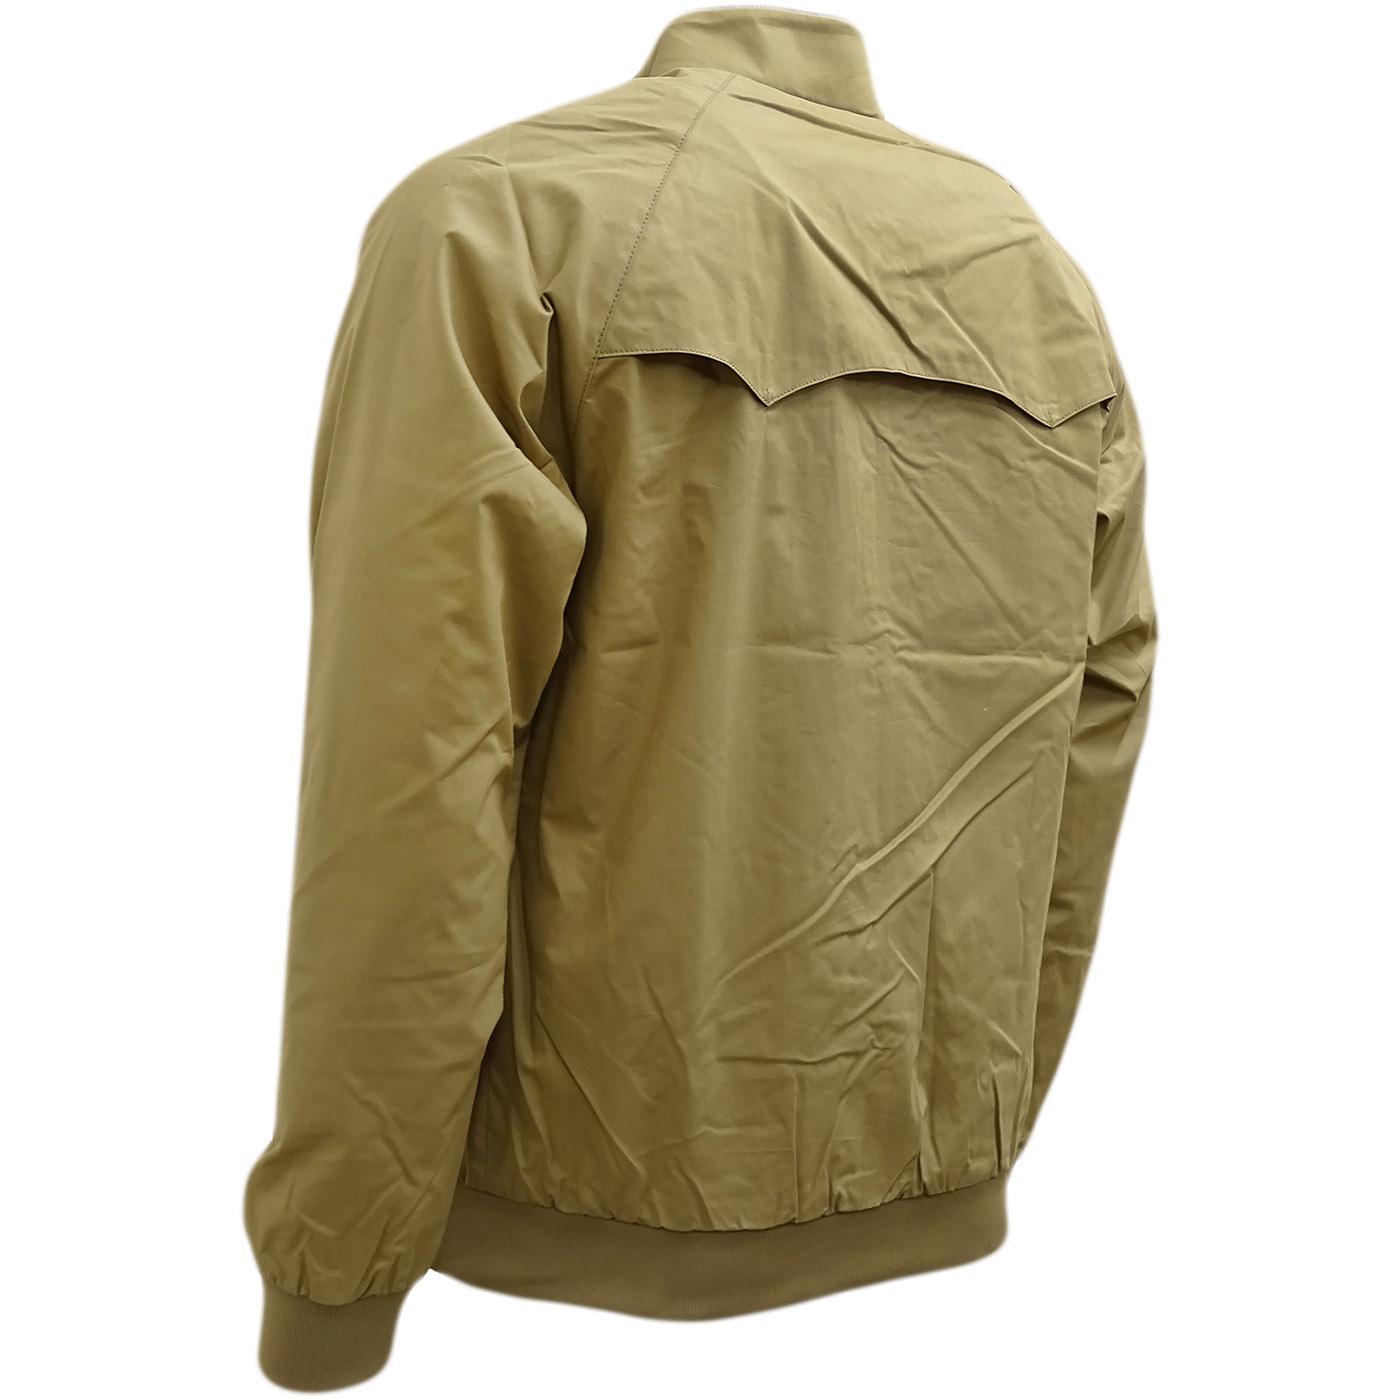 8b25c176 Sentinel Ben Sherman Original Gingham Lining Harrington Jacket / Outerwear  Coat - Mf13639